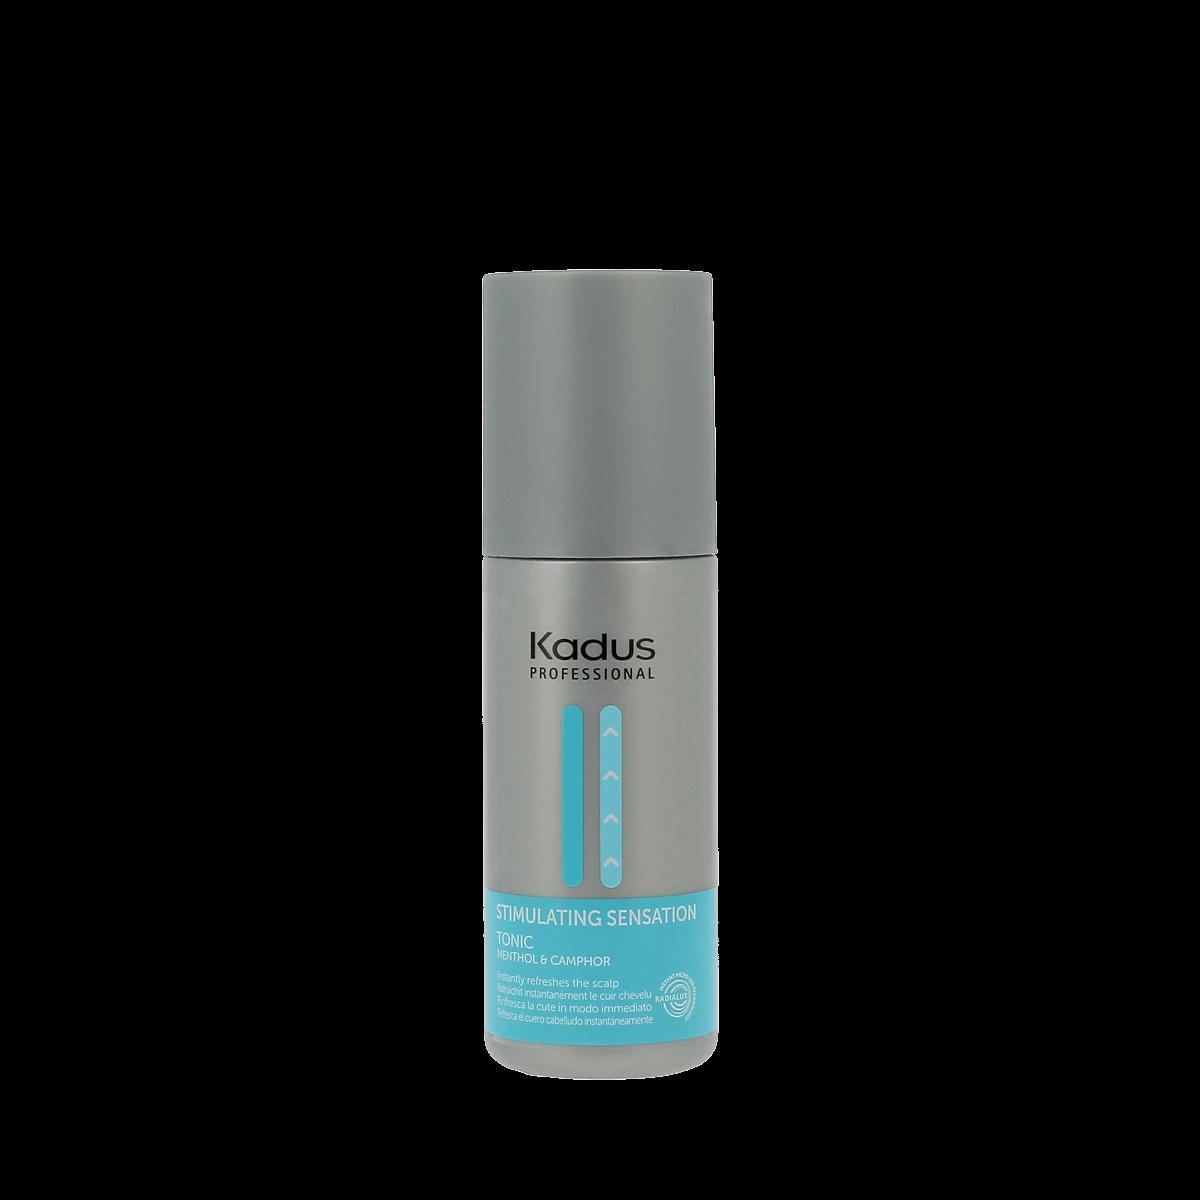 Buy Kadus Professional Stimulating Sensation Tonic 150ml Salon Wholesale